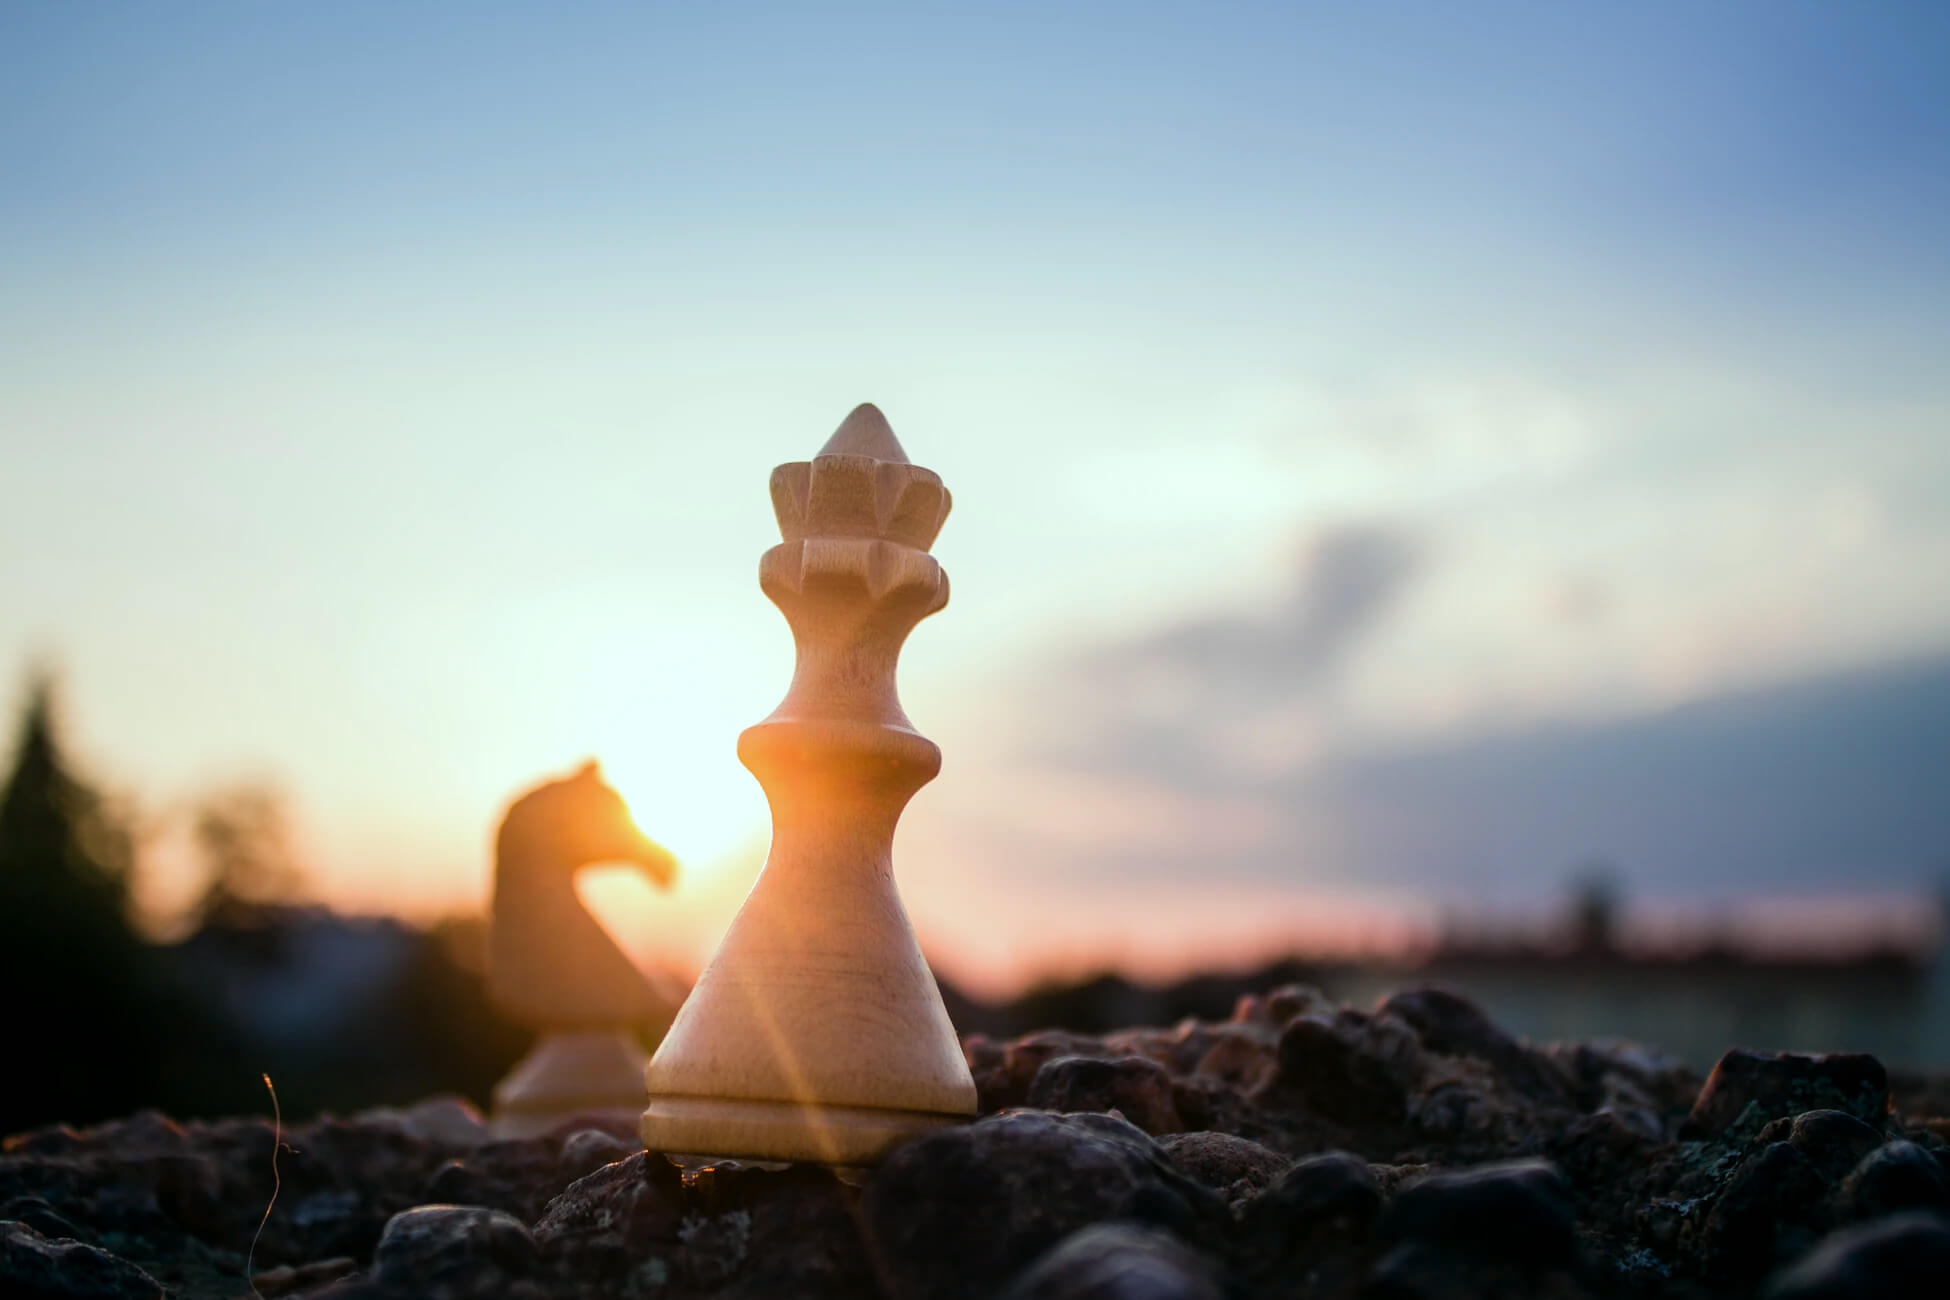 peca de xadrez